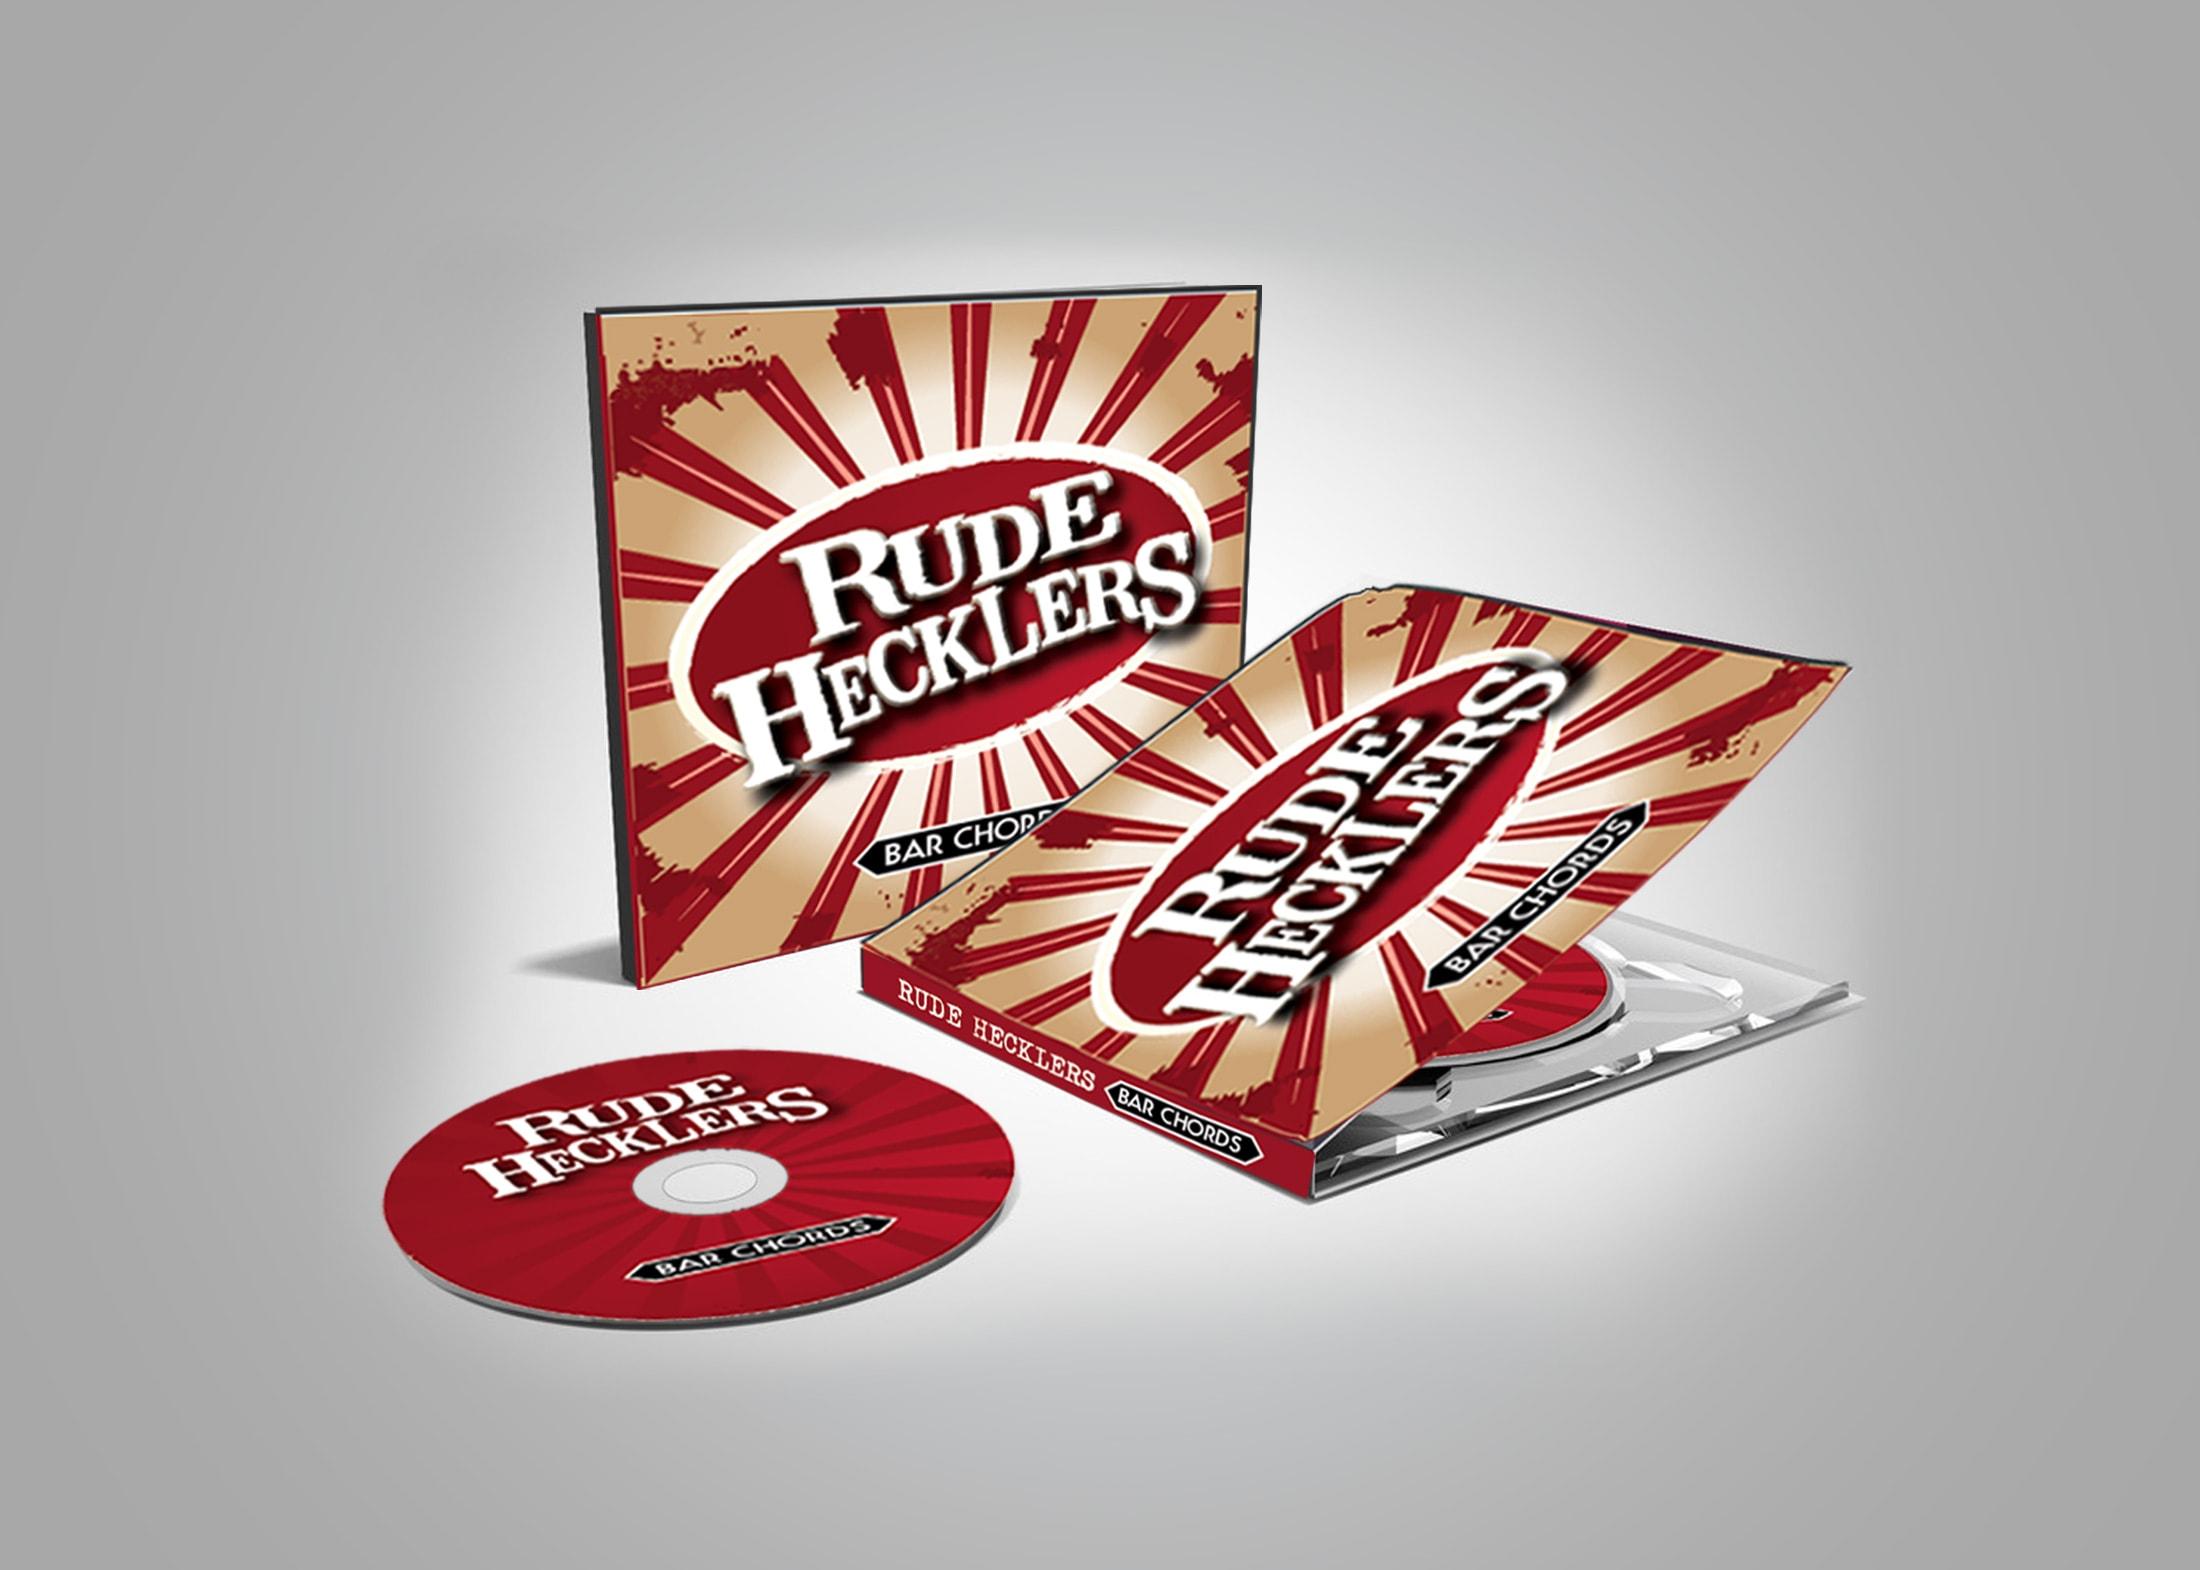 rude-hecklers-album-artwork